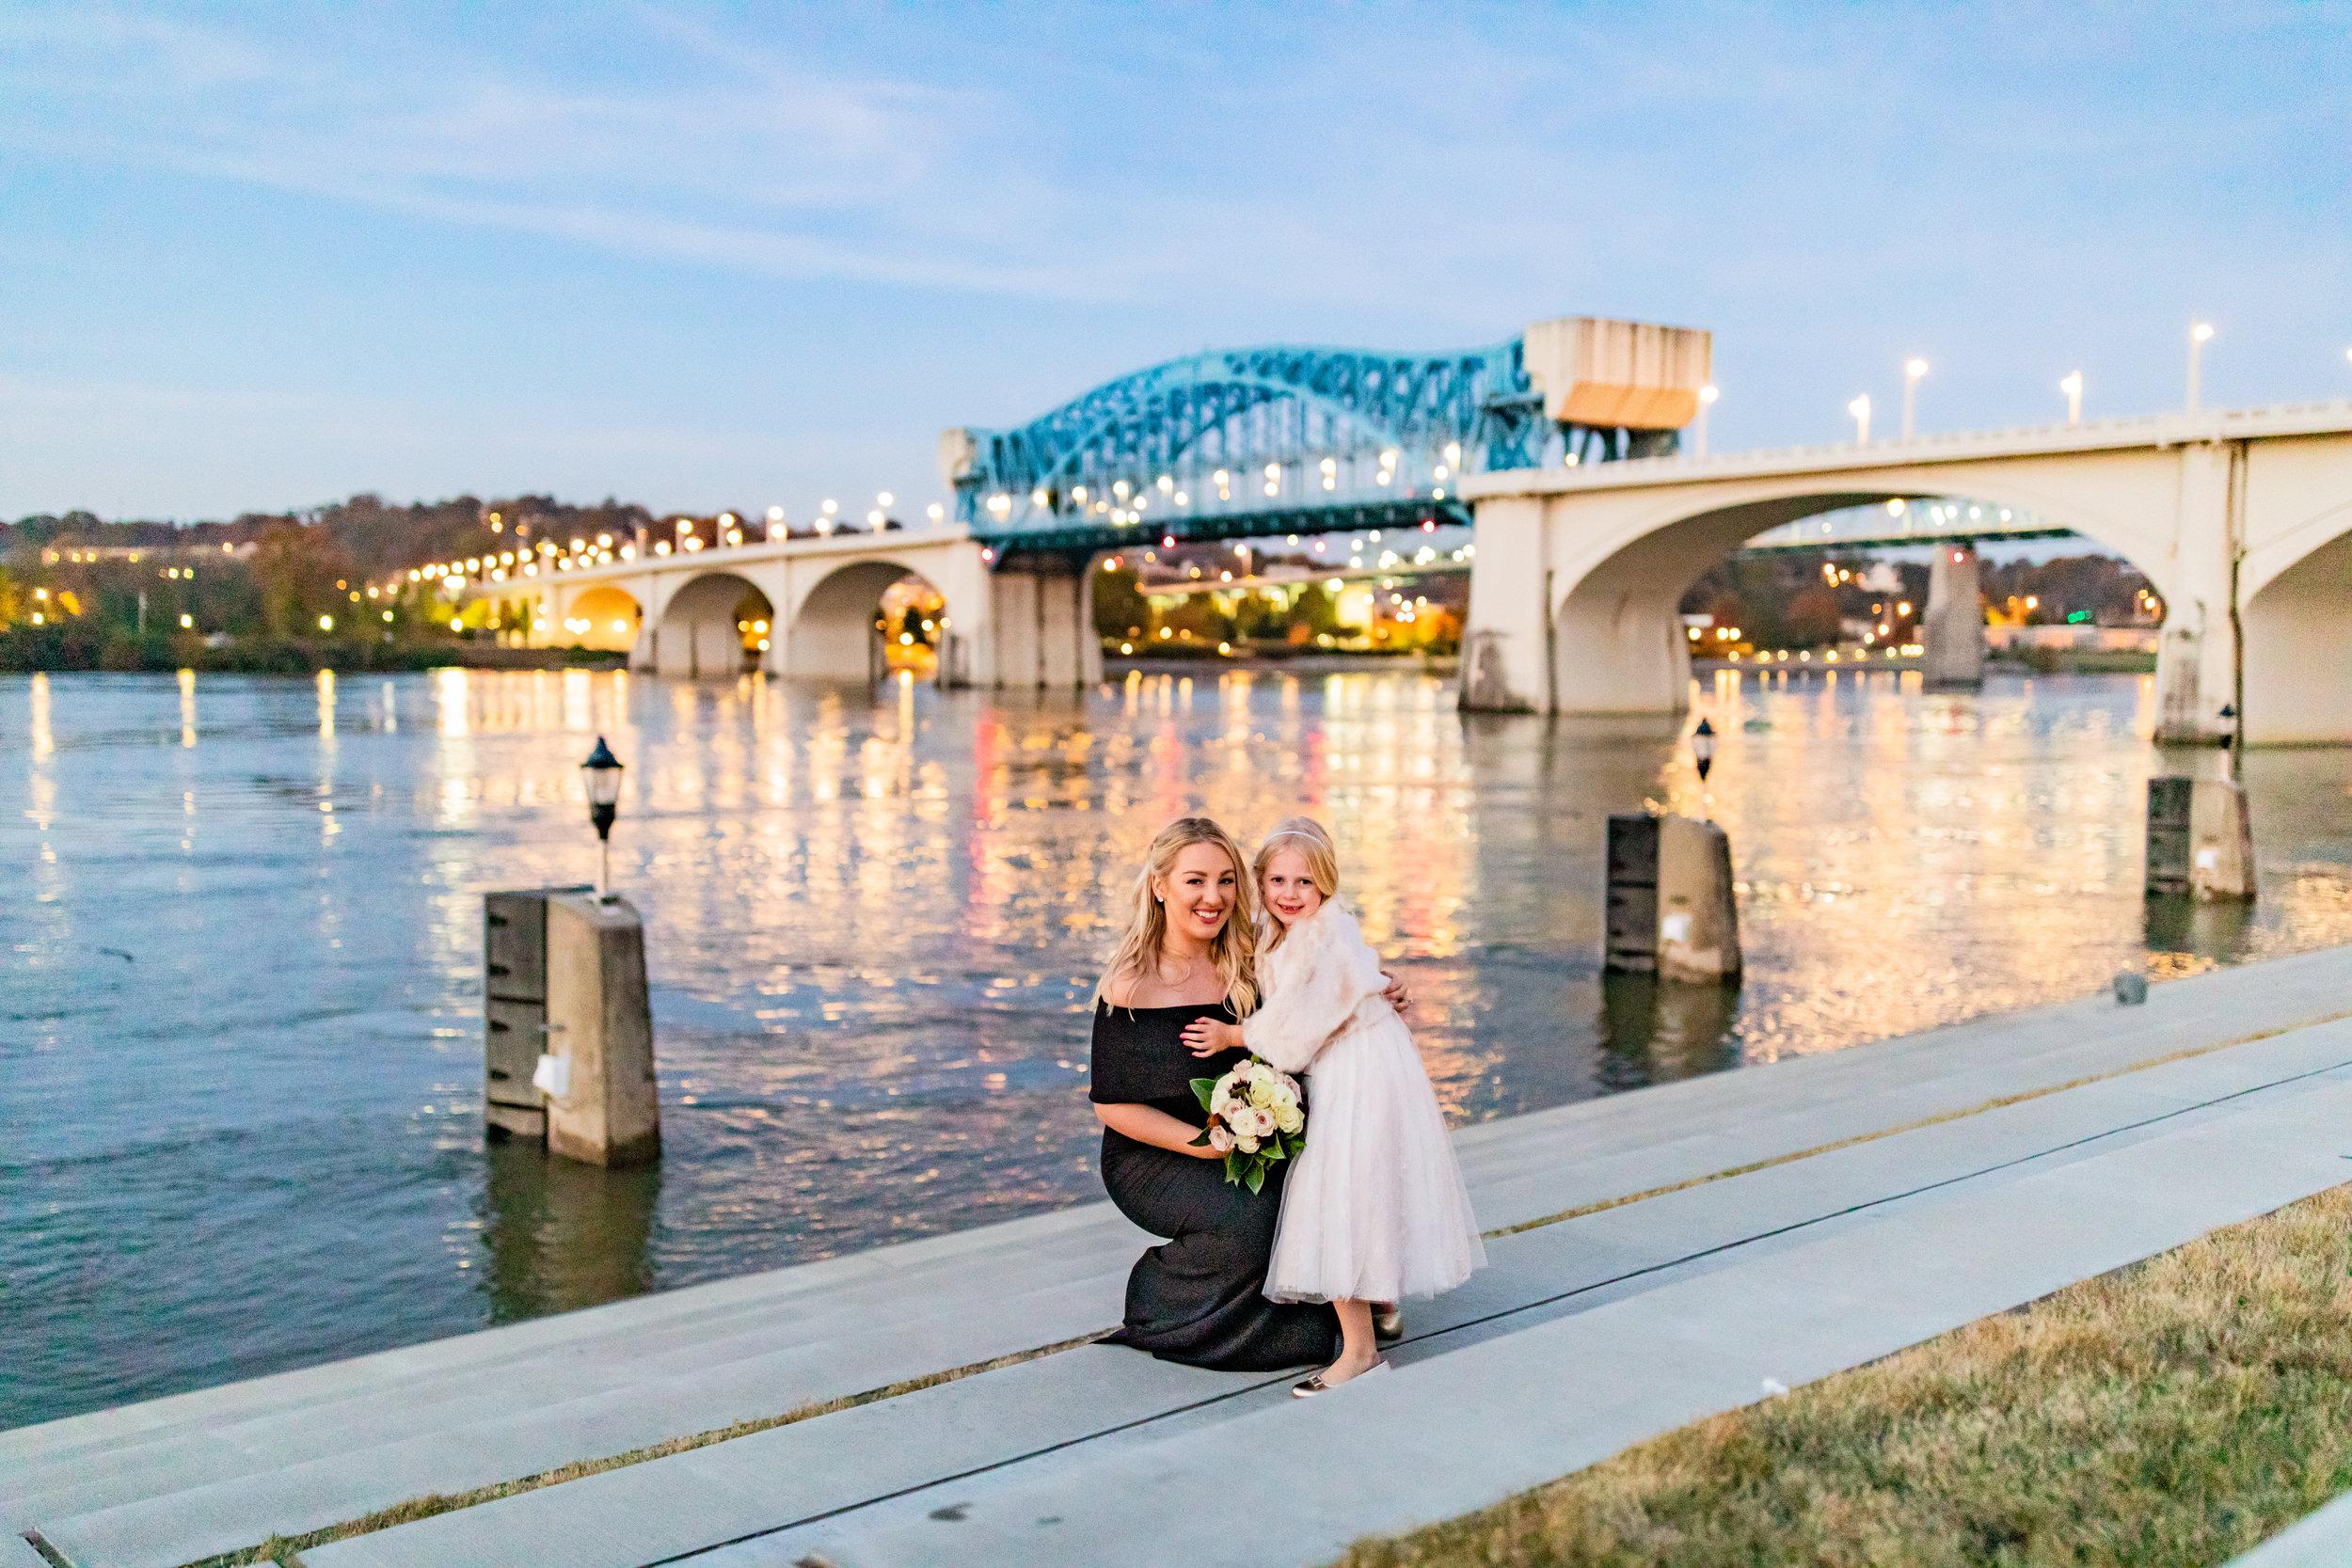 Wedding_Emily_Lester_Photography-520.jpg